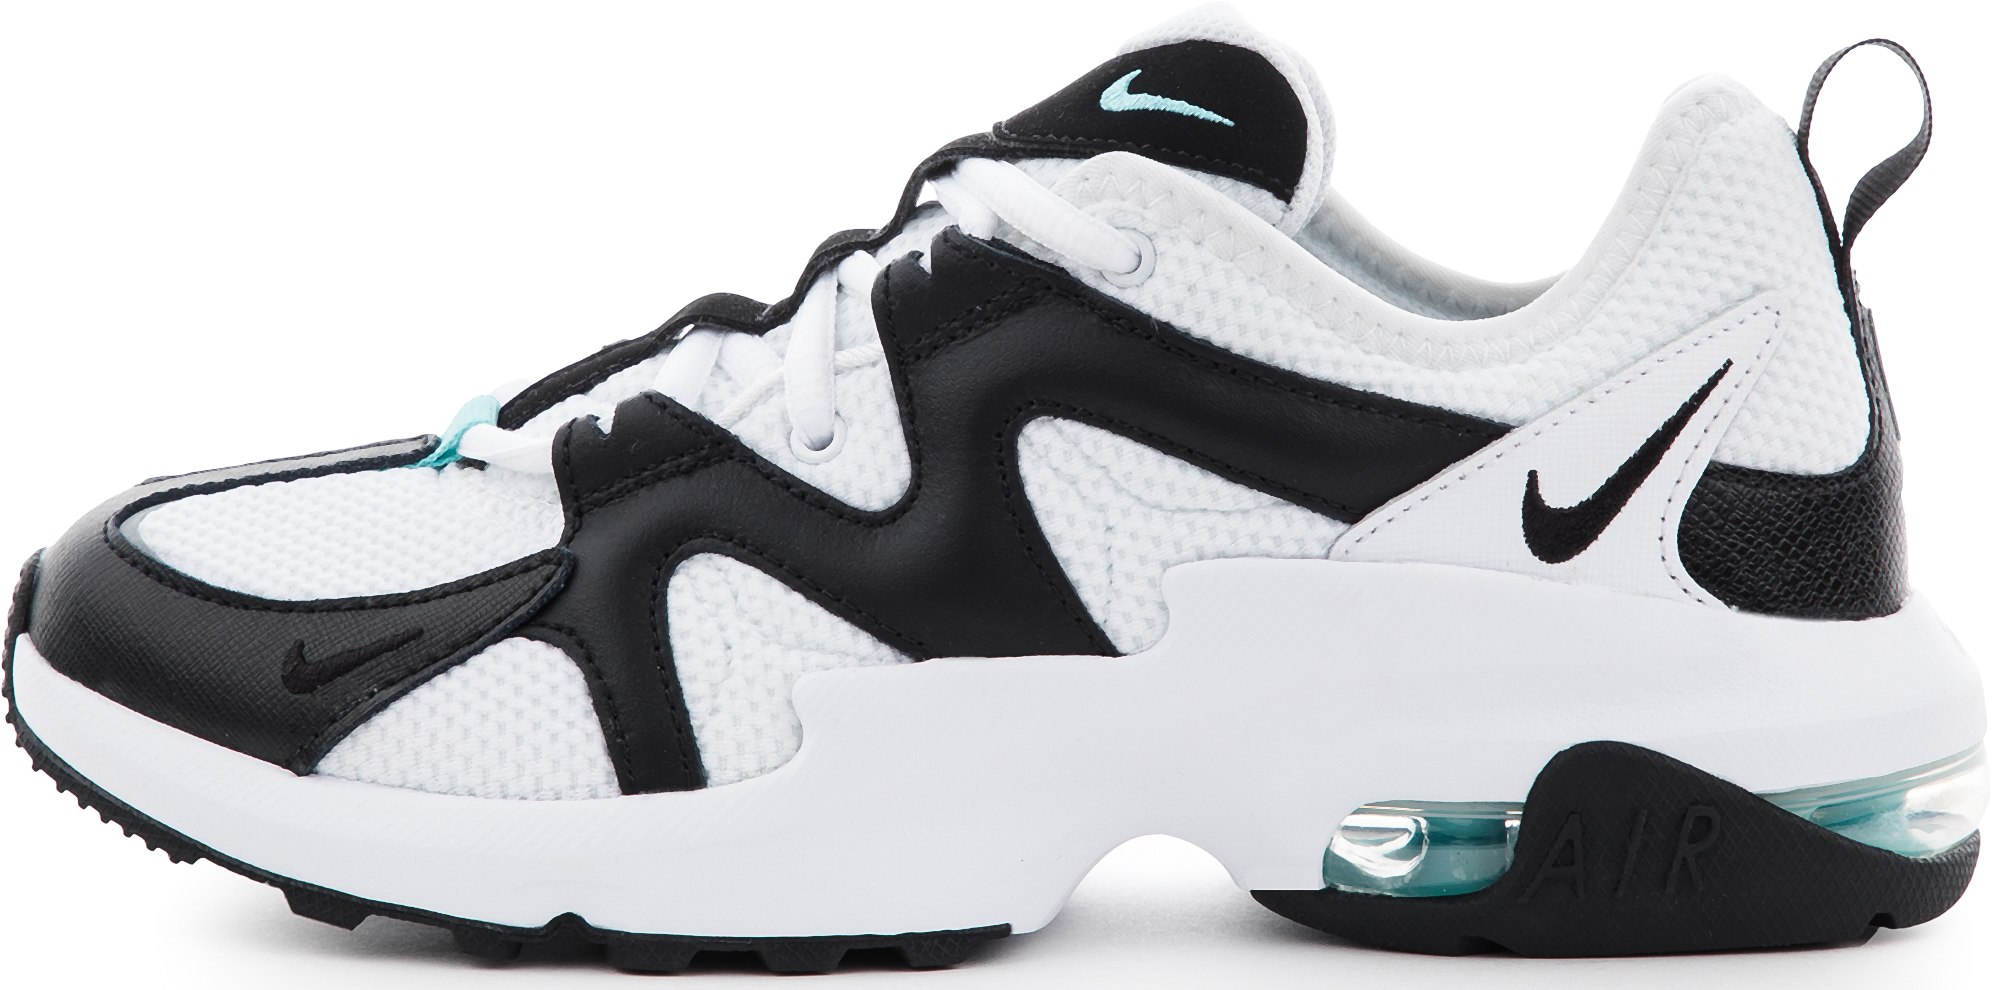 Nike Кроссовки женские Nike Air Max Graviton, размер 39 все цены